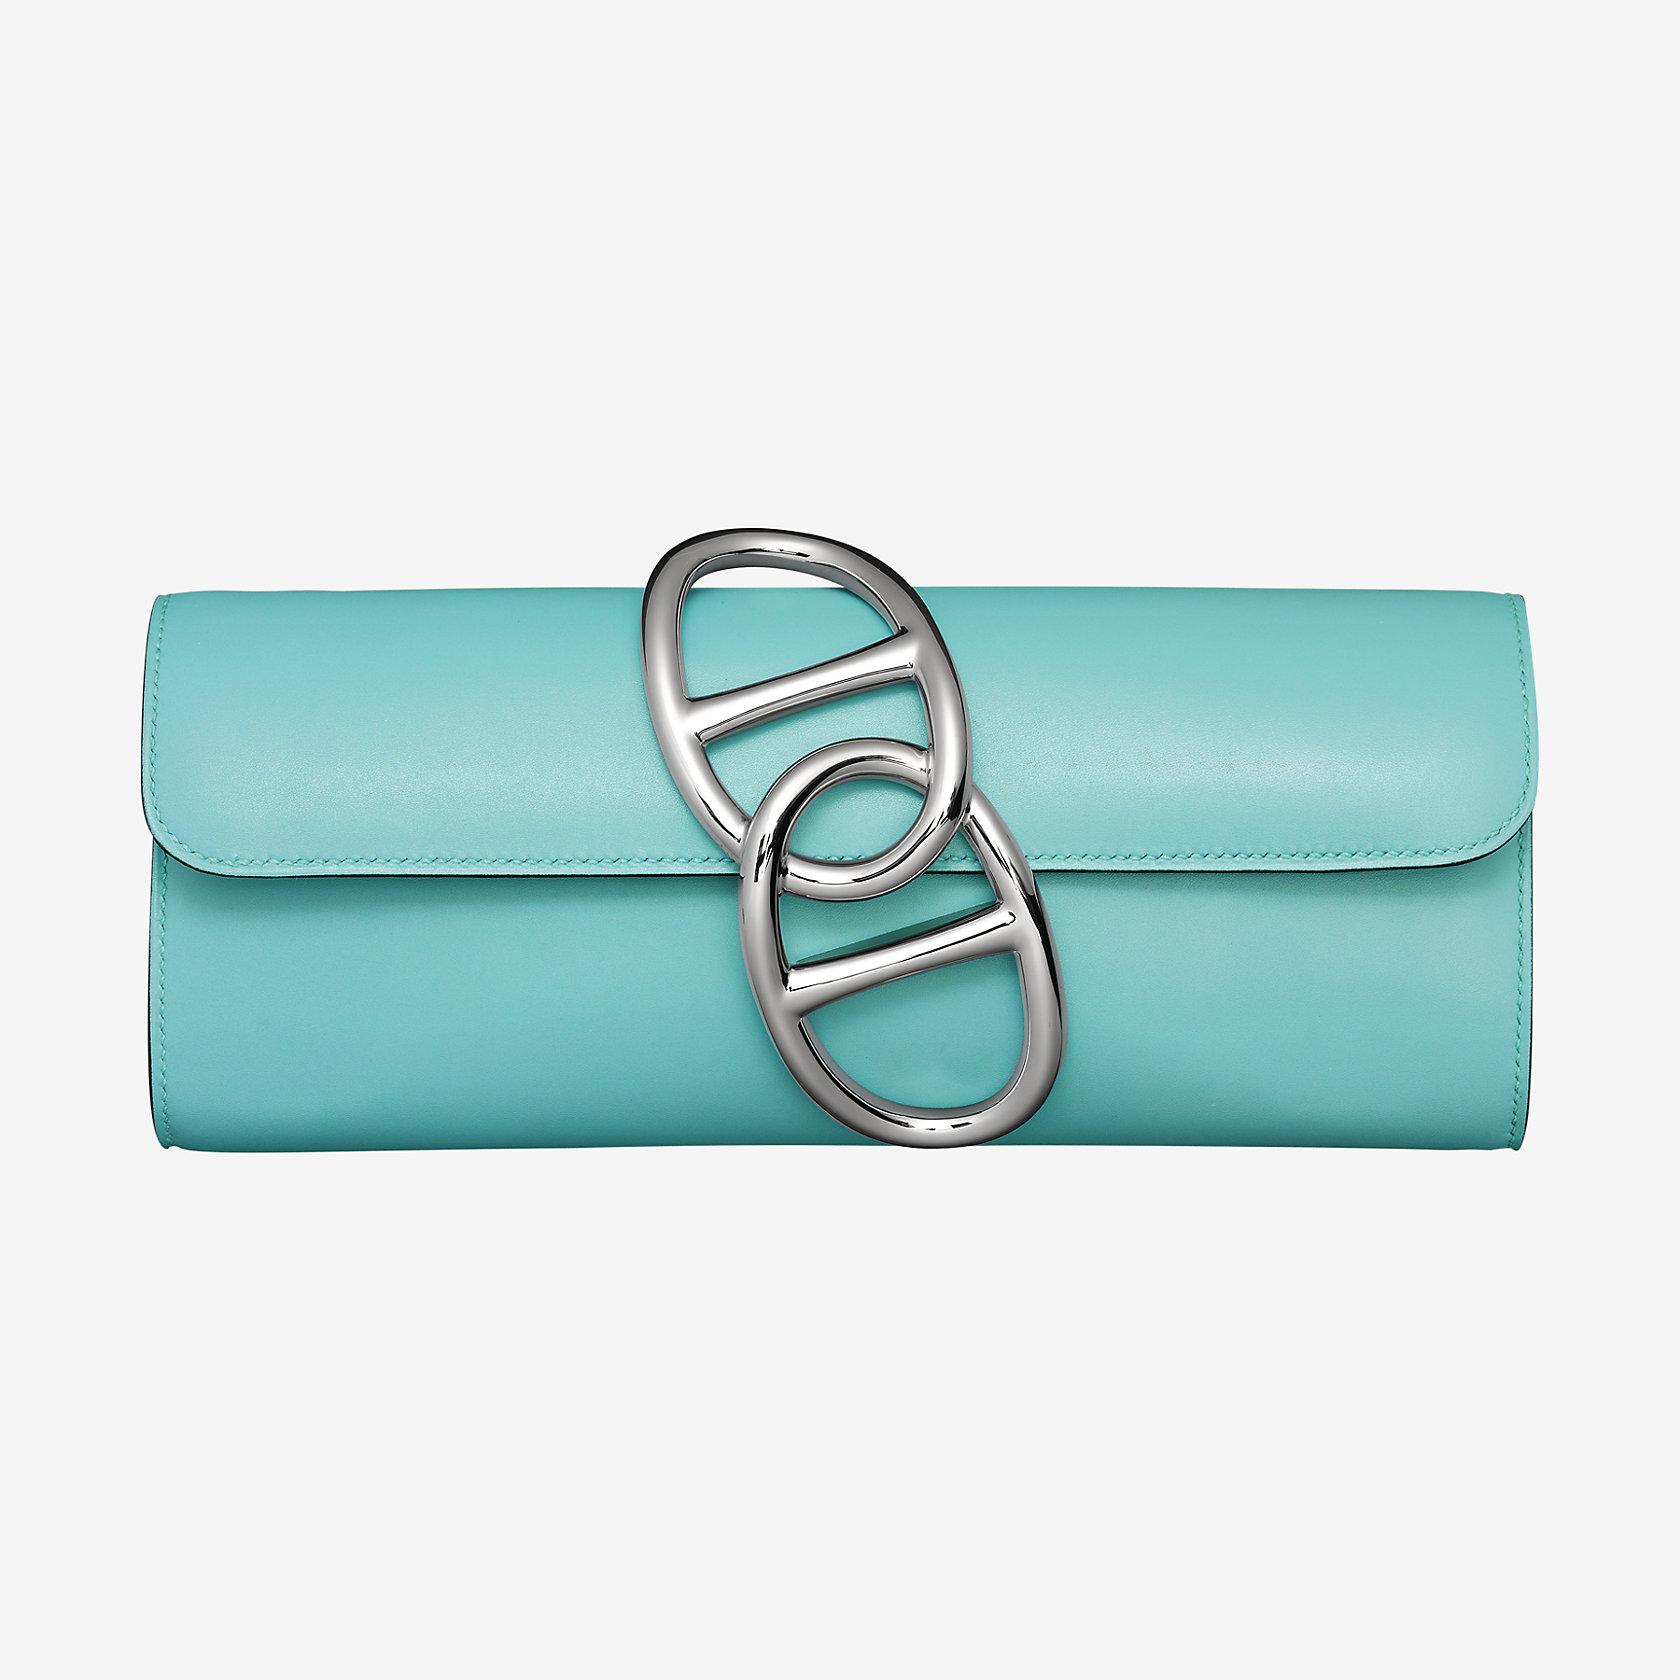 Hermès clutch | Hermes,LOVE!! | Pinterest